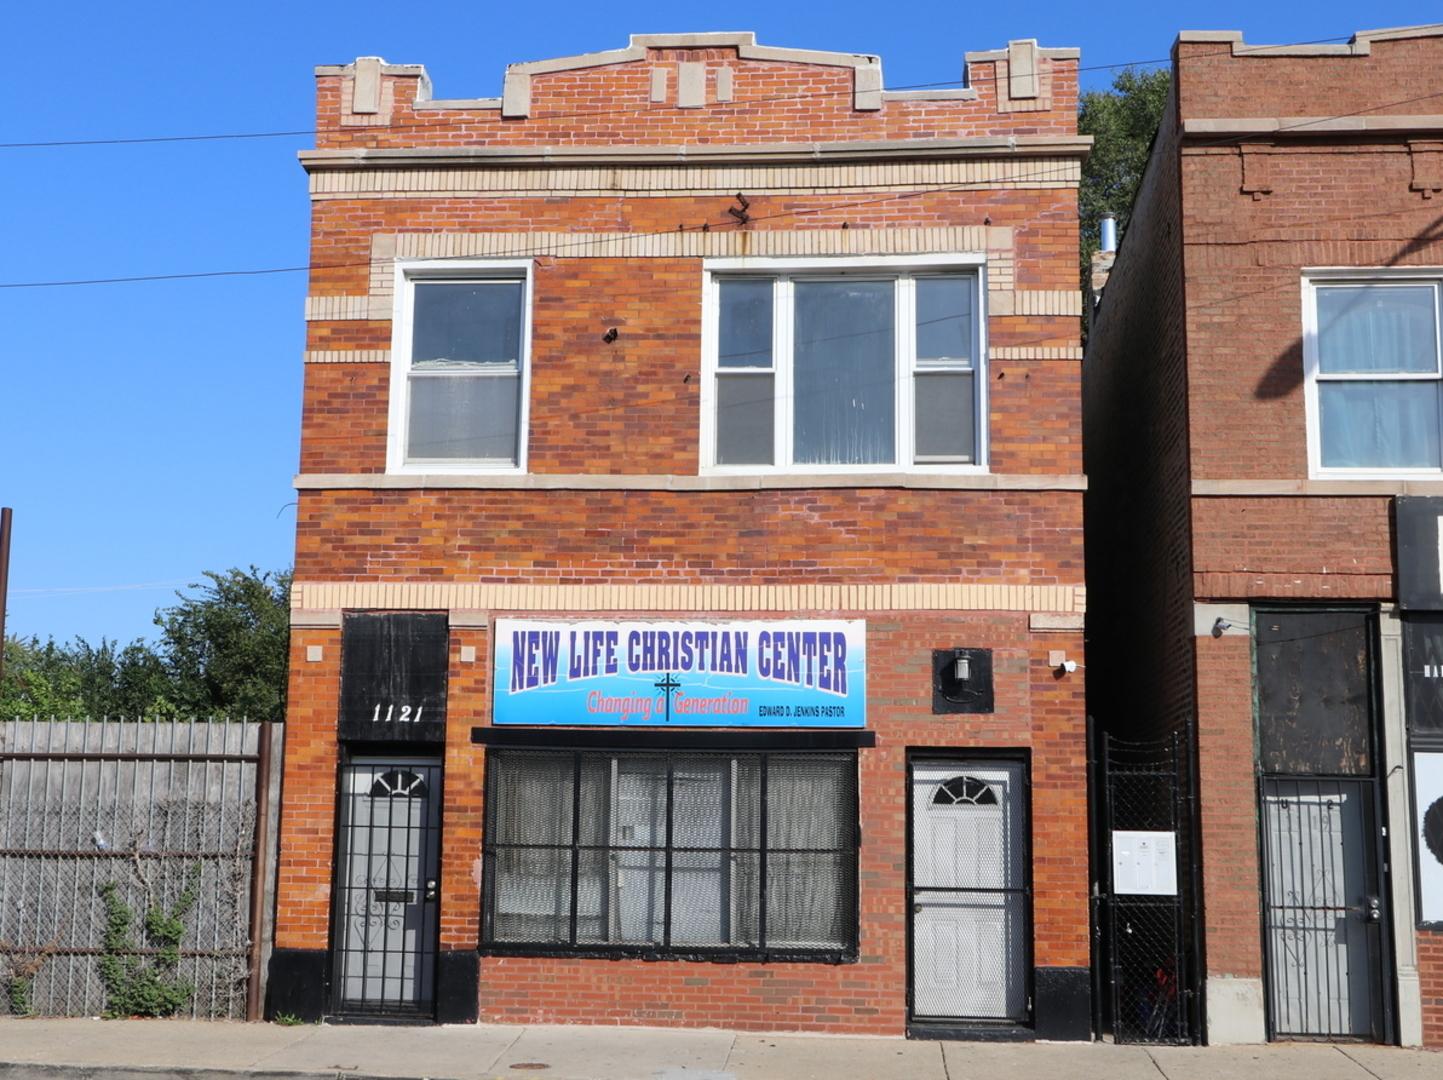 1121 N Pulaski Road, Chicago, IL 60651